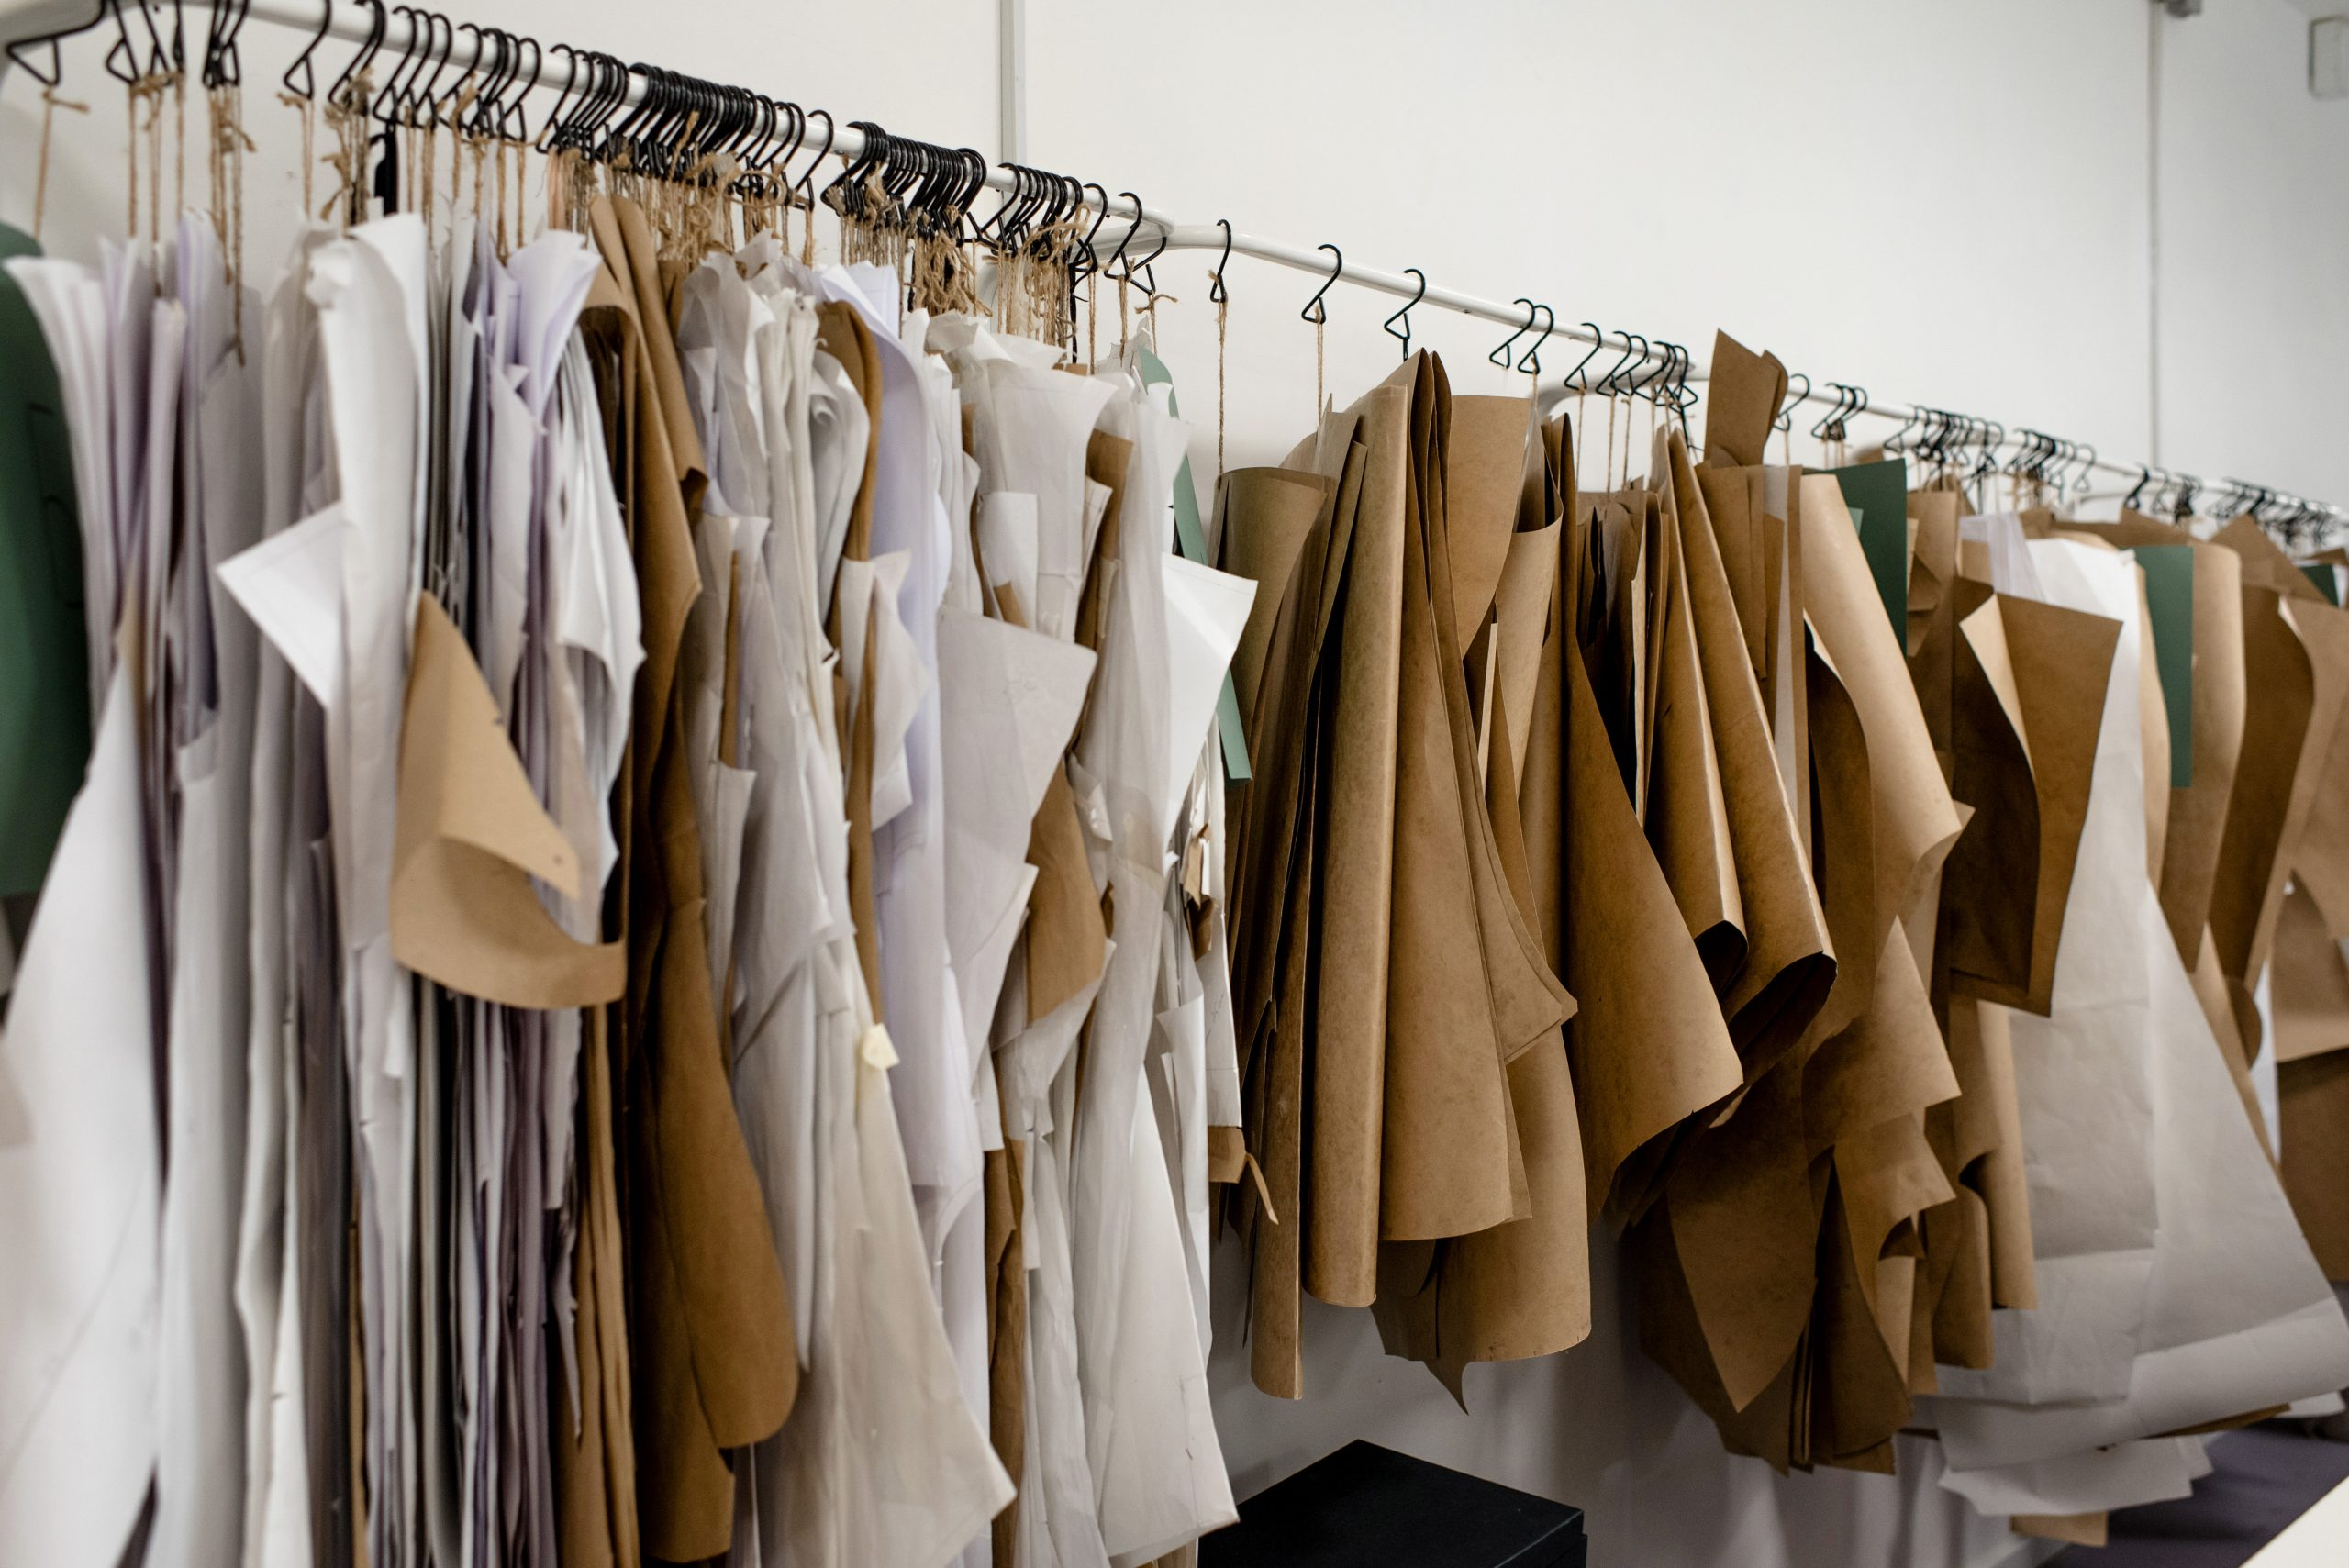 Produsen Pakaian Wanita, Assorted sewing patterns on hangers inside tailor atelier